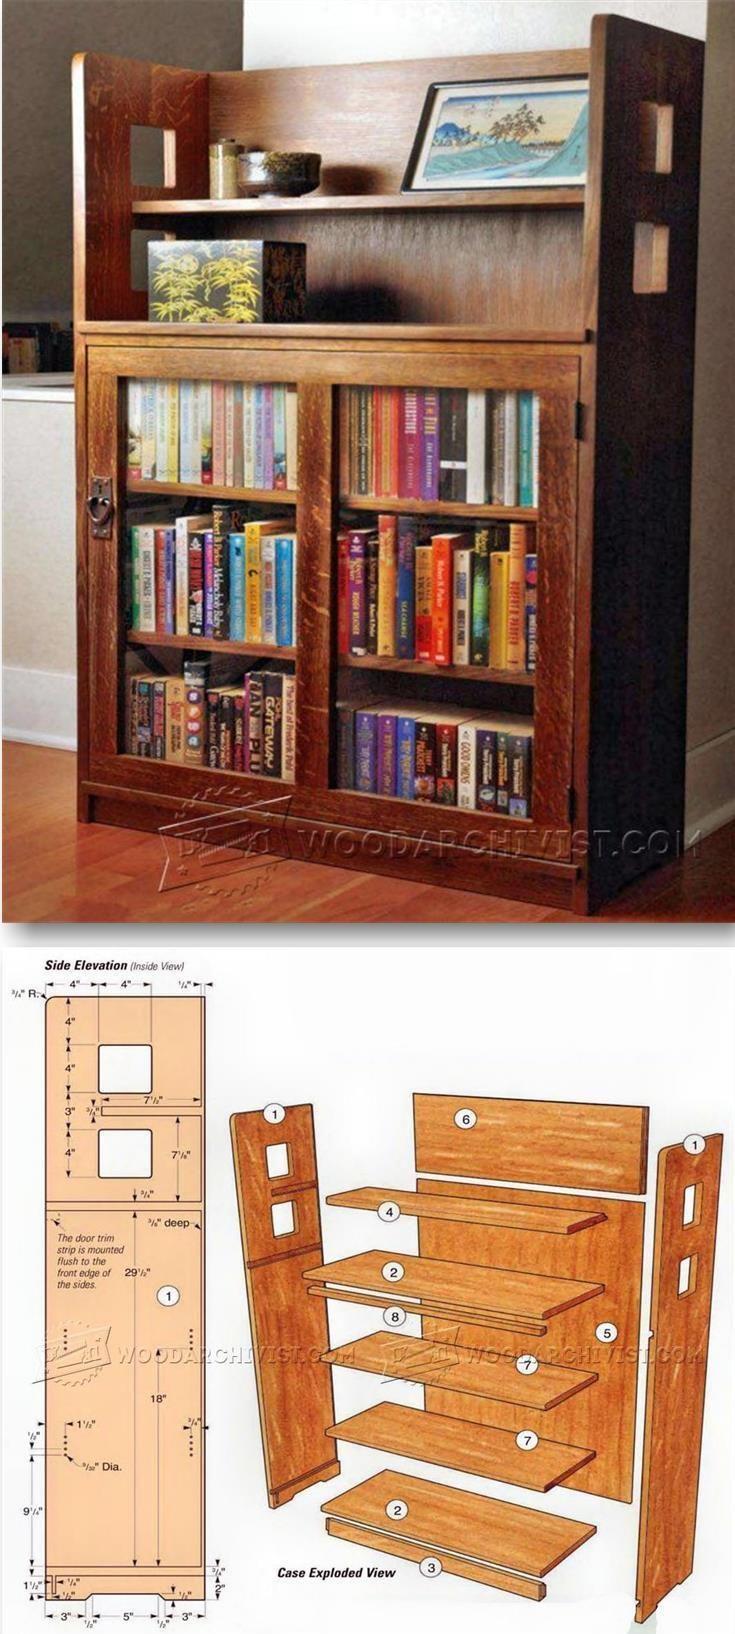 Bookcase Plans Furniture Plans And Projects Woodarchivist Com  # Menuiserie:Download Images Meubles Tv